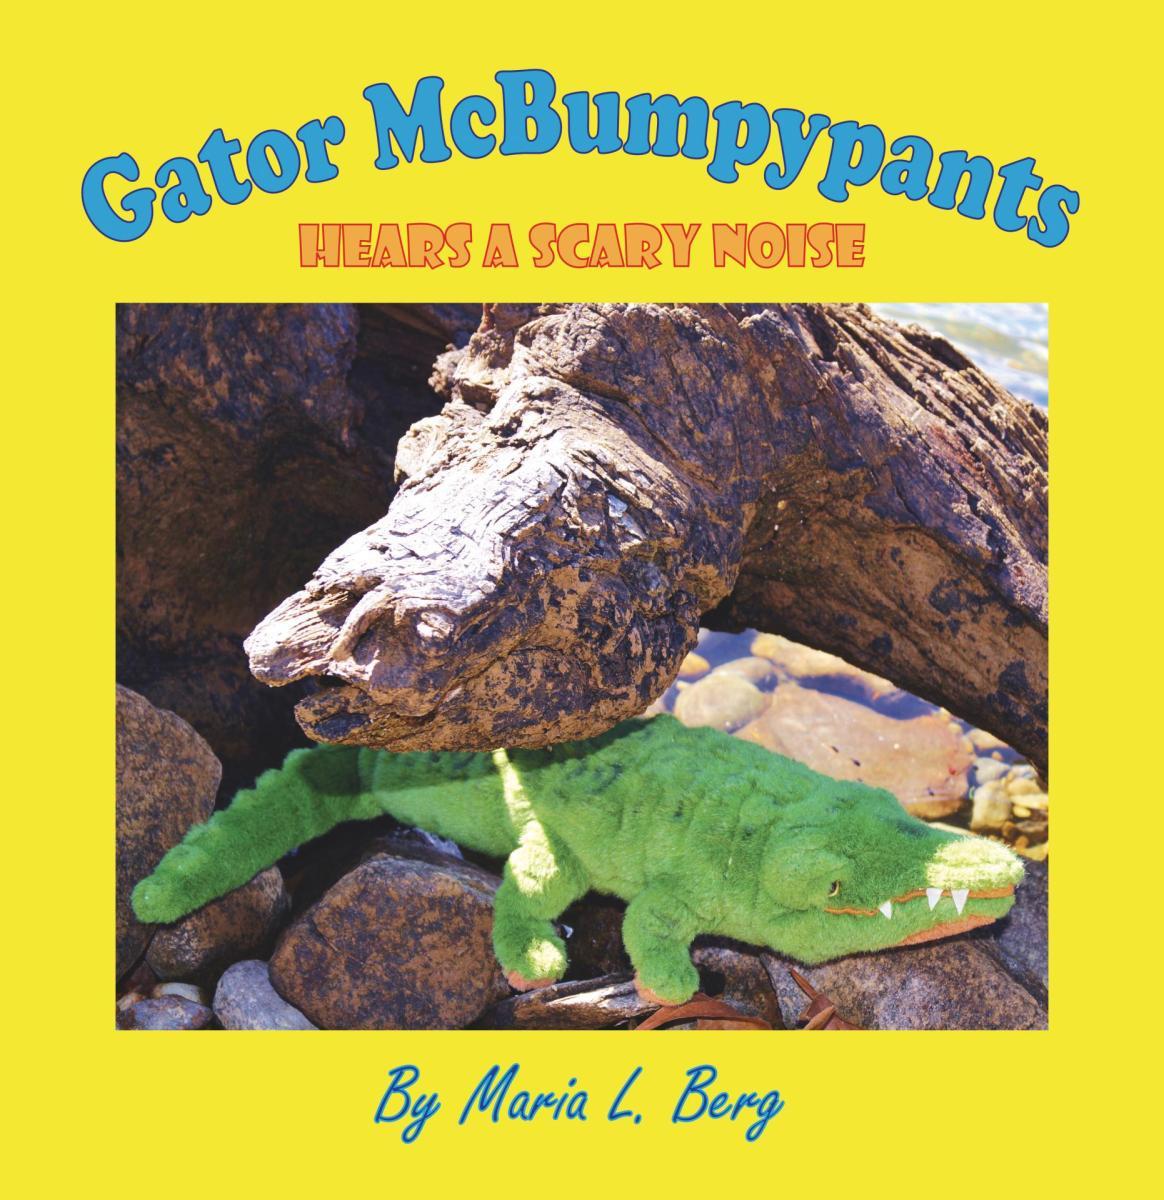 Gator McBumpypants Hears a Scary Noise